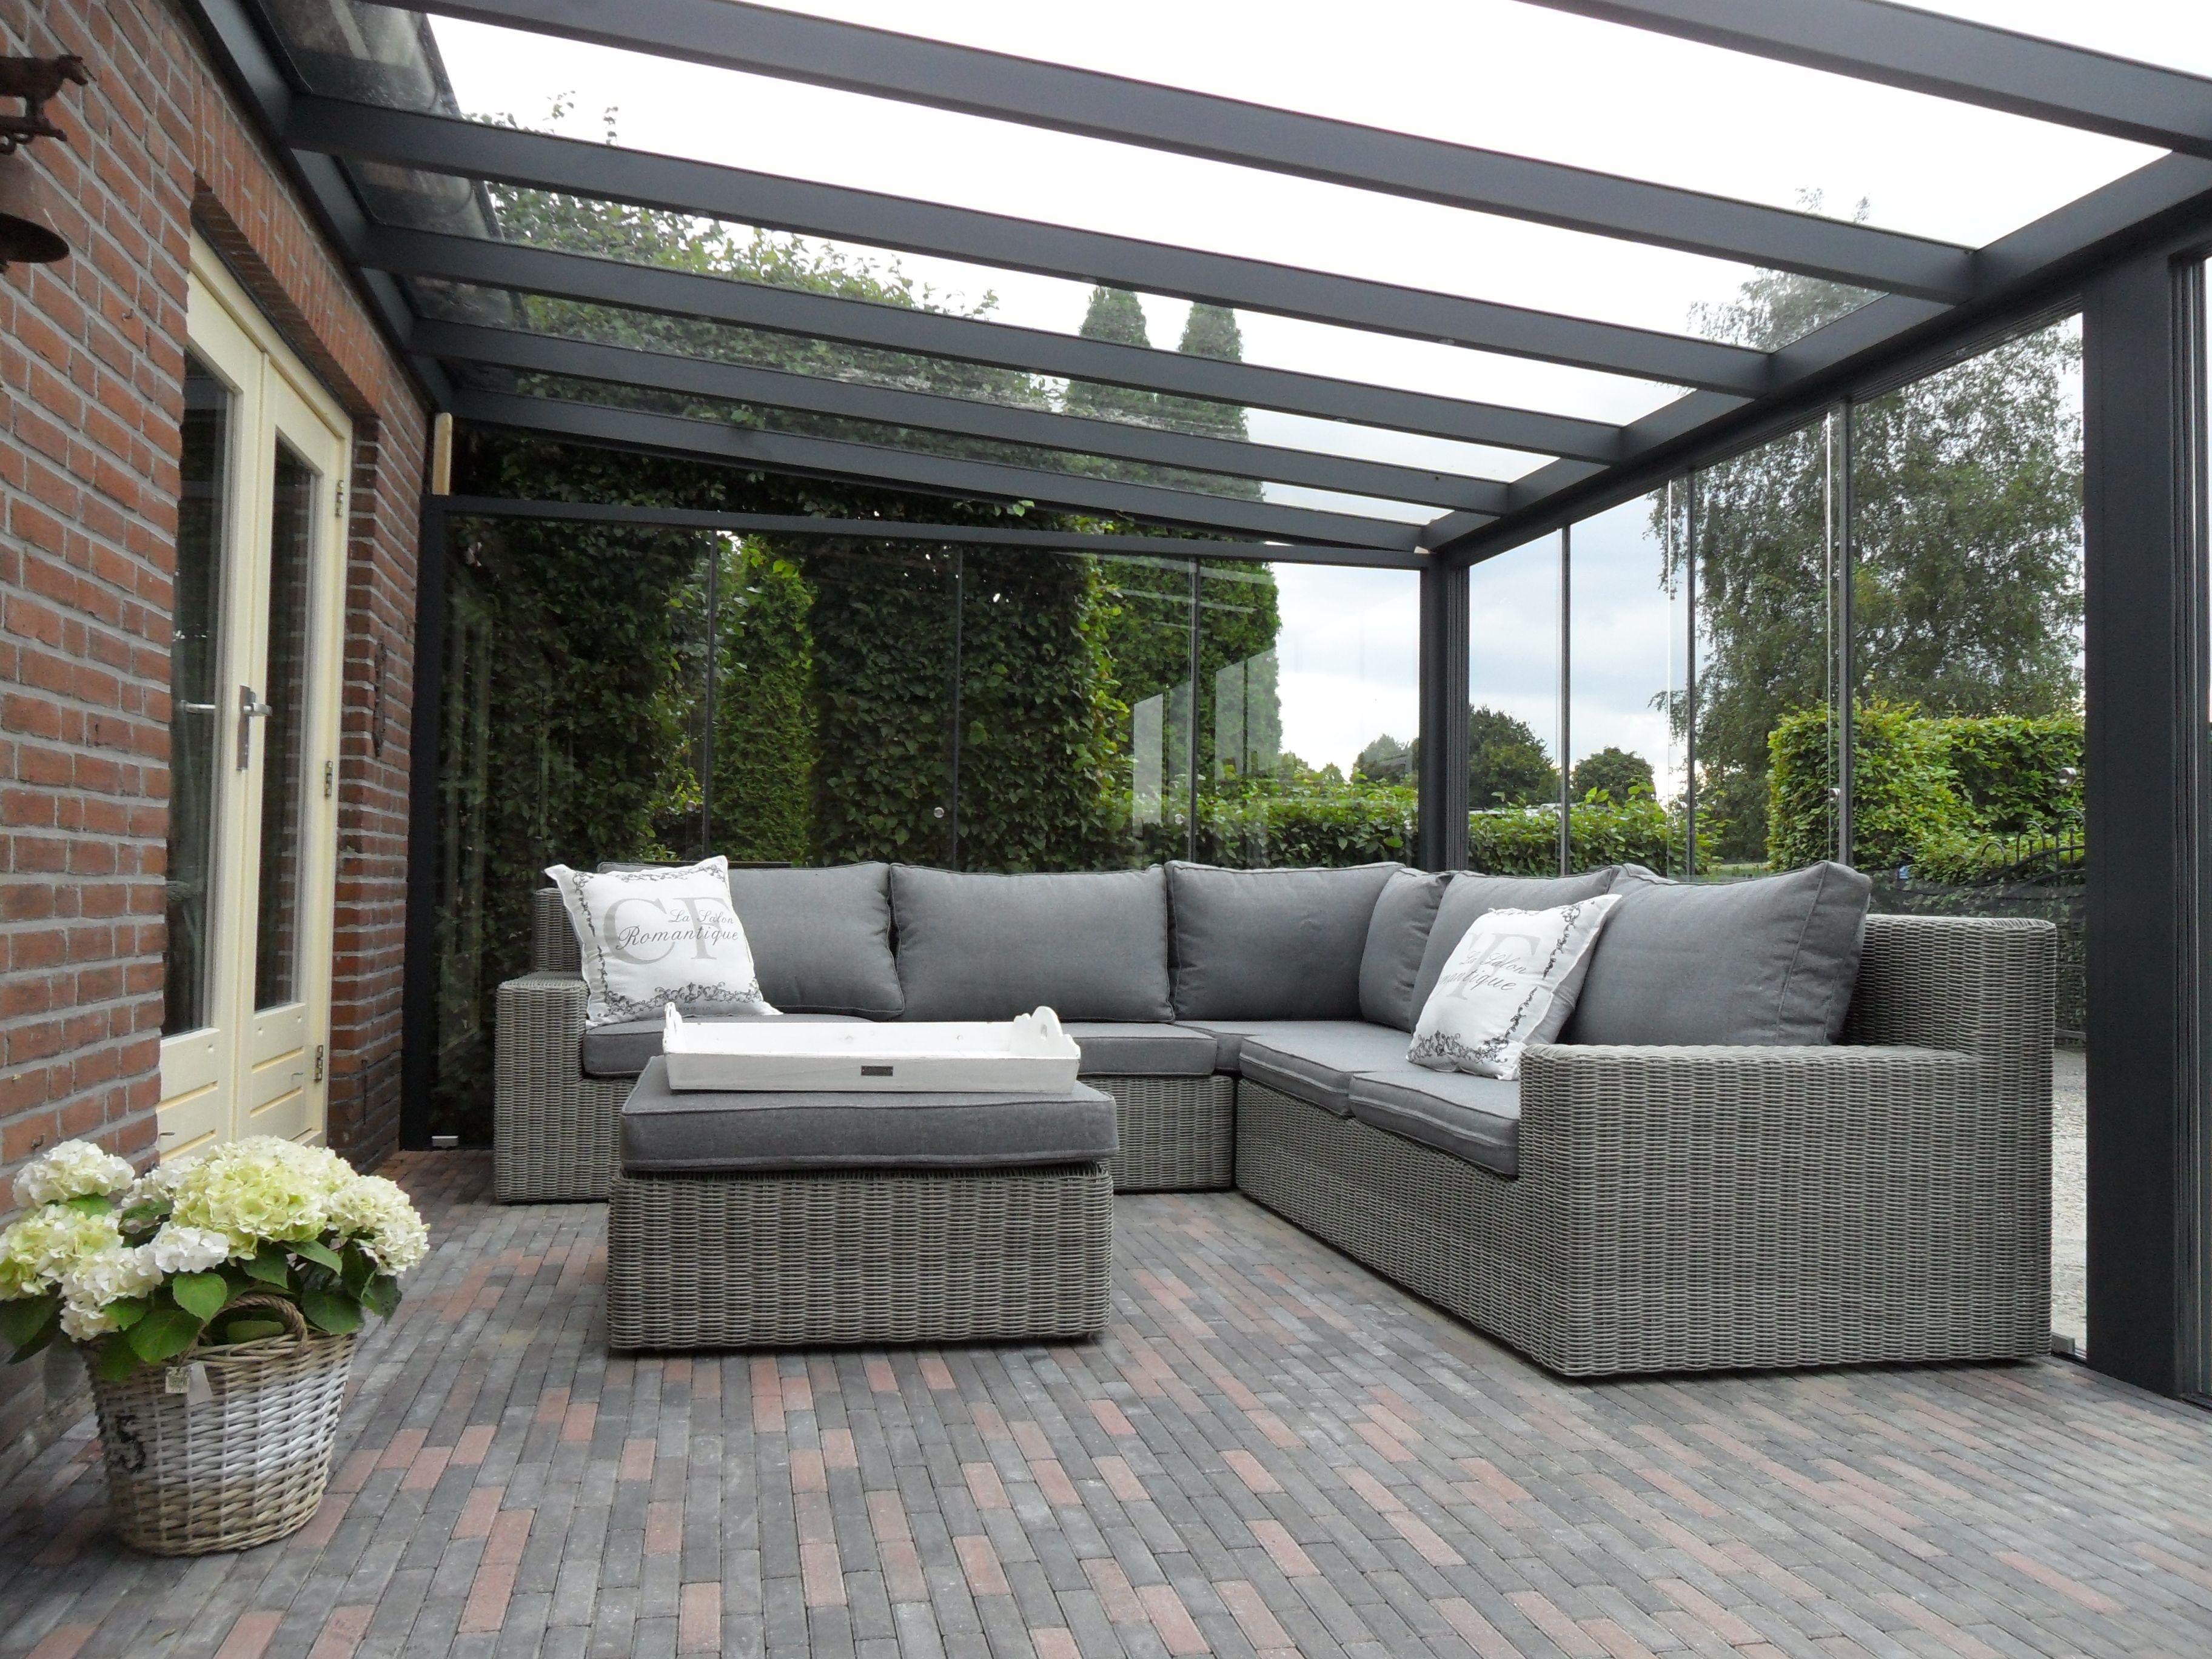 Stijlvolle aluminium veranda terrasoverkappig met